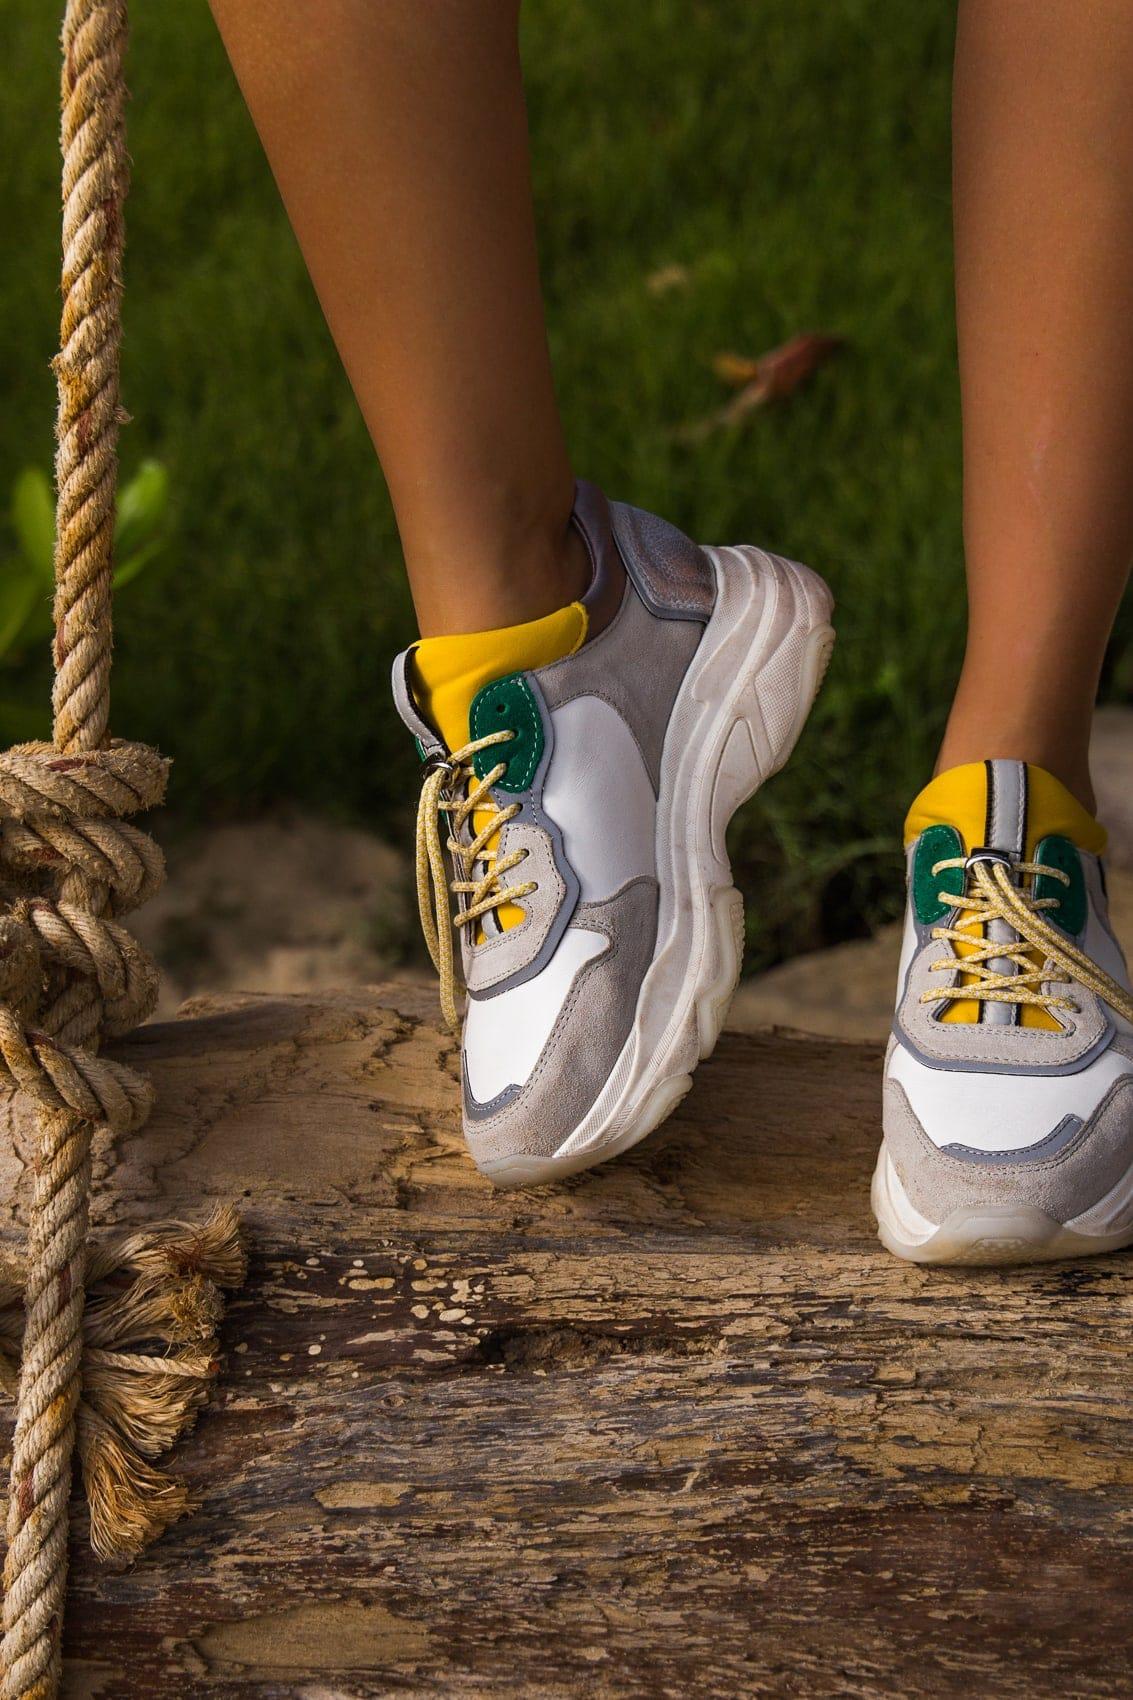 Ugly Dad Sneakers? So kombinierst du den Trend im Sommer!